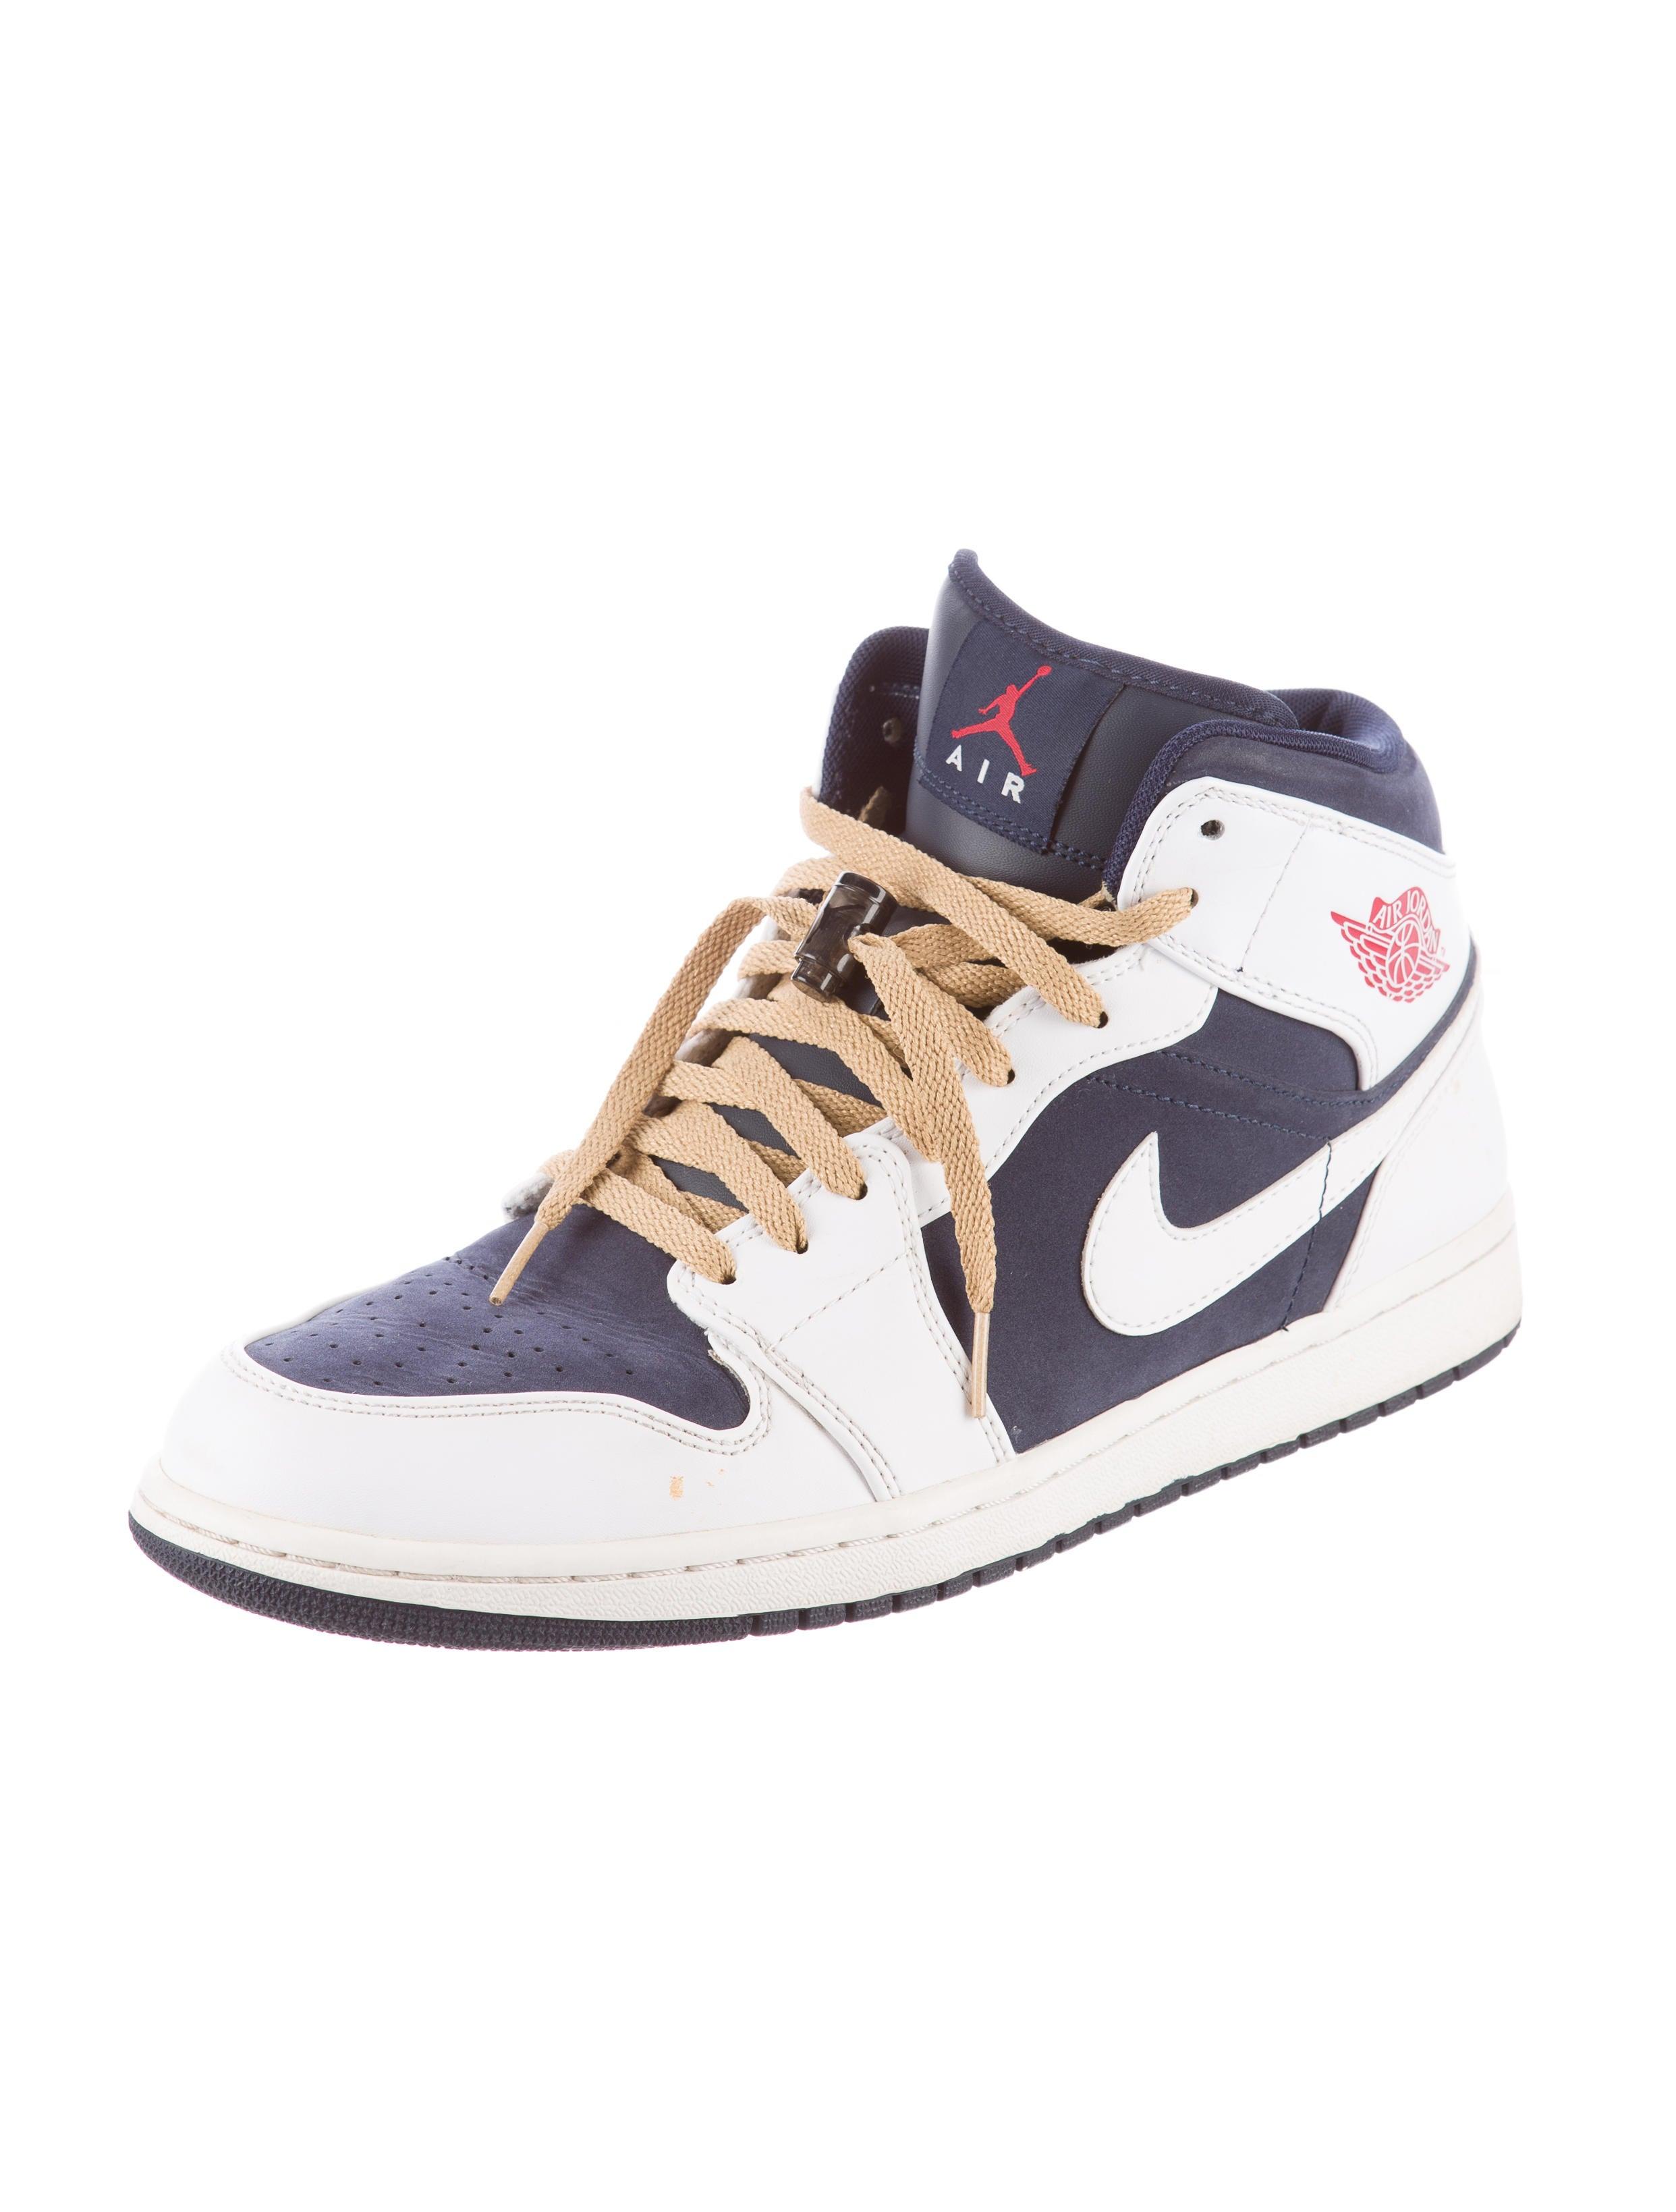 nike air jordan 1 mid sneakers shoes wu220494 the. Black Bedroom Furniture Sets. Home Design Ideas